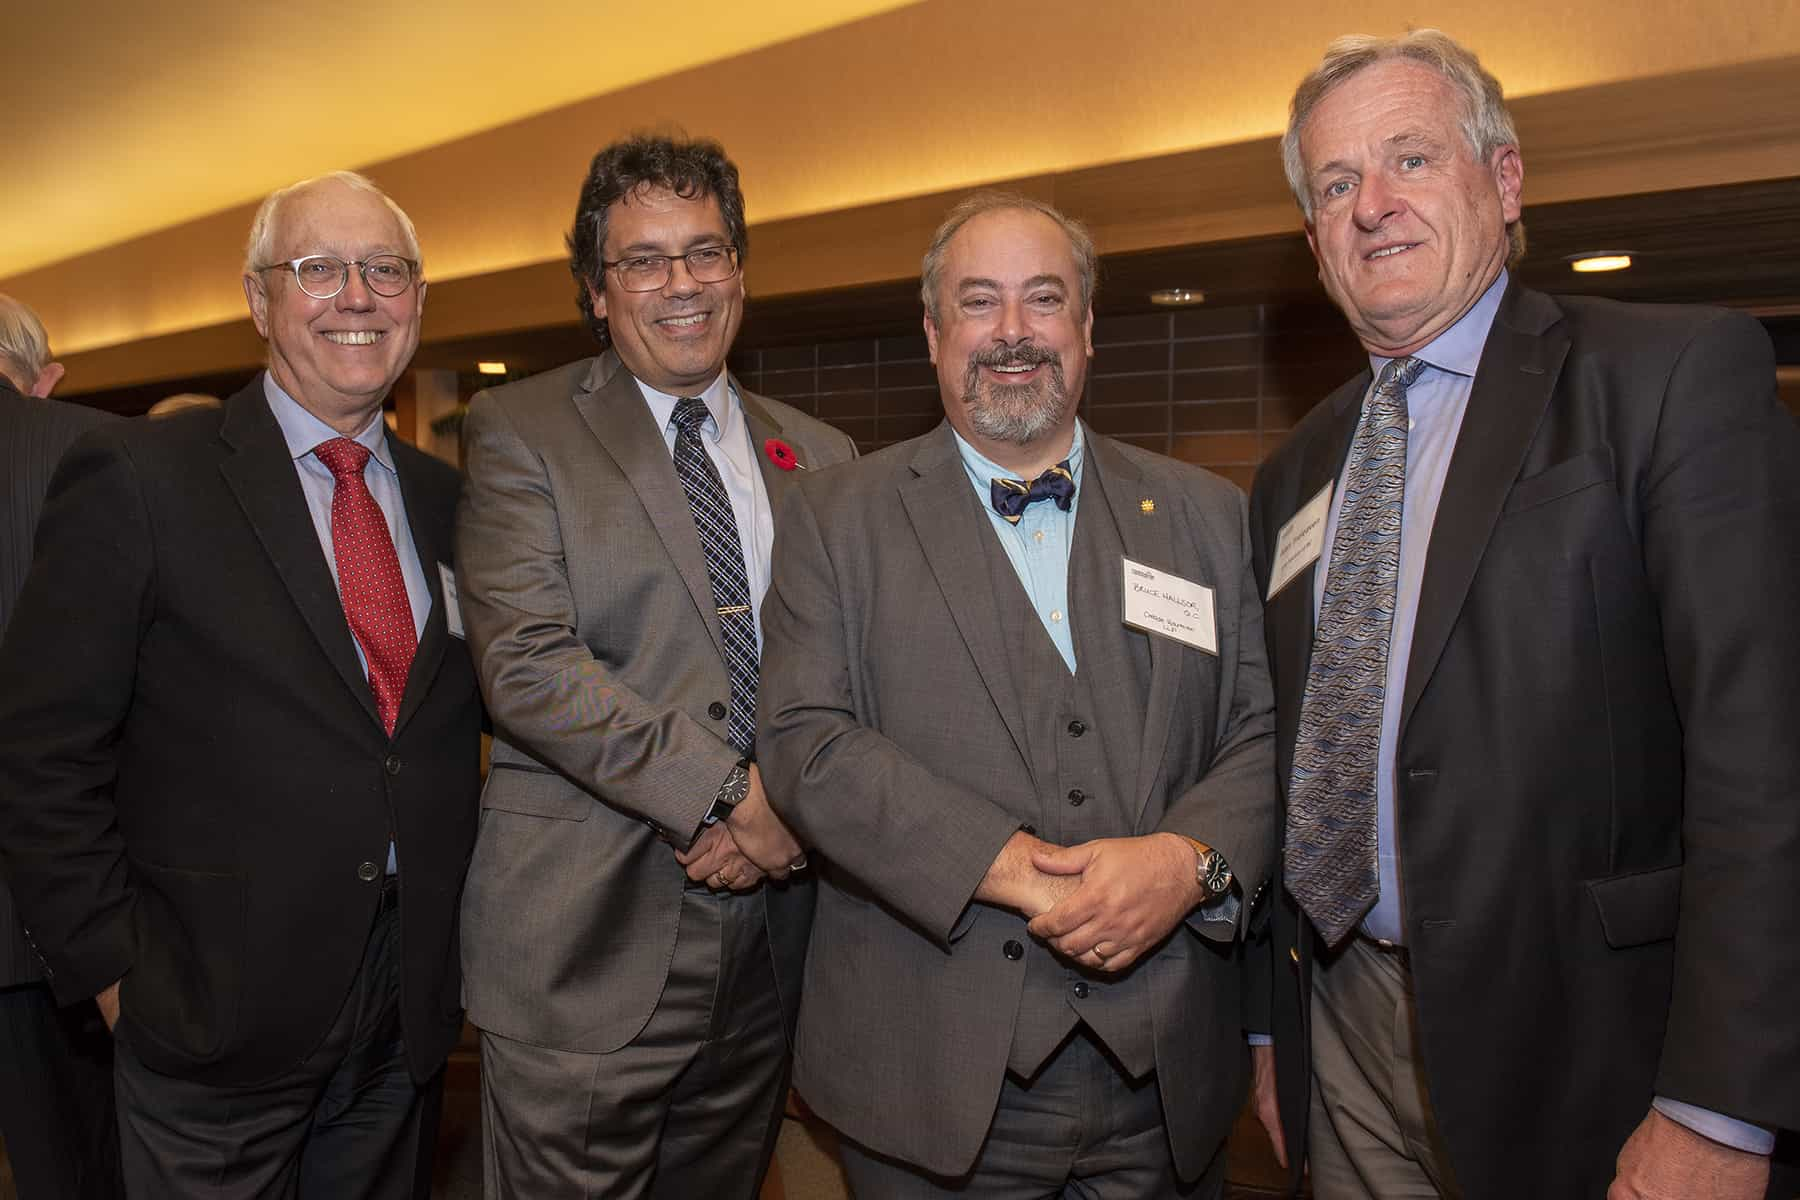 Murray Rankin, QC; James Legh; Bruce Hallsor, QC; Alan Treleaven